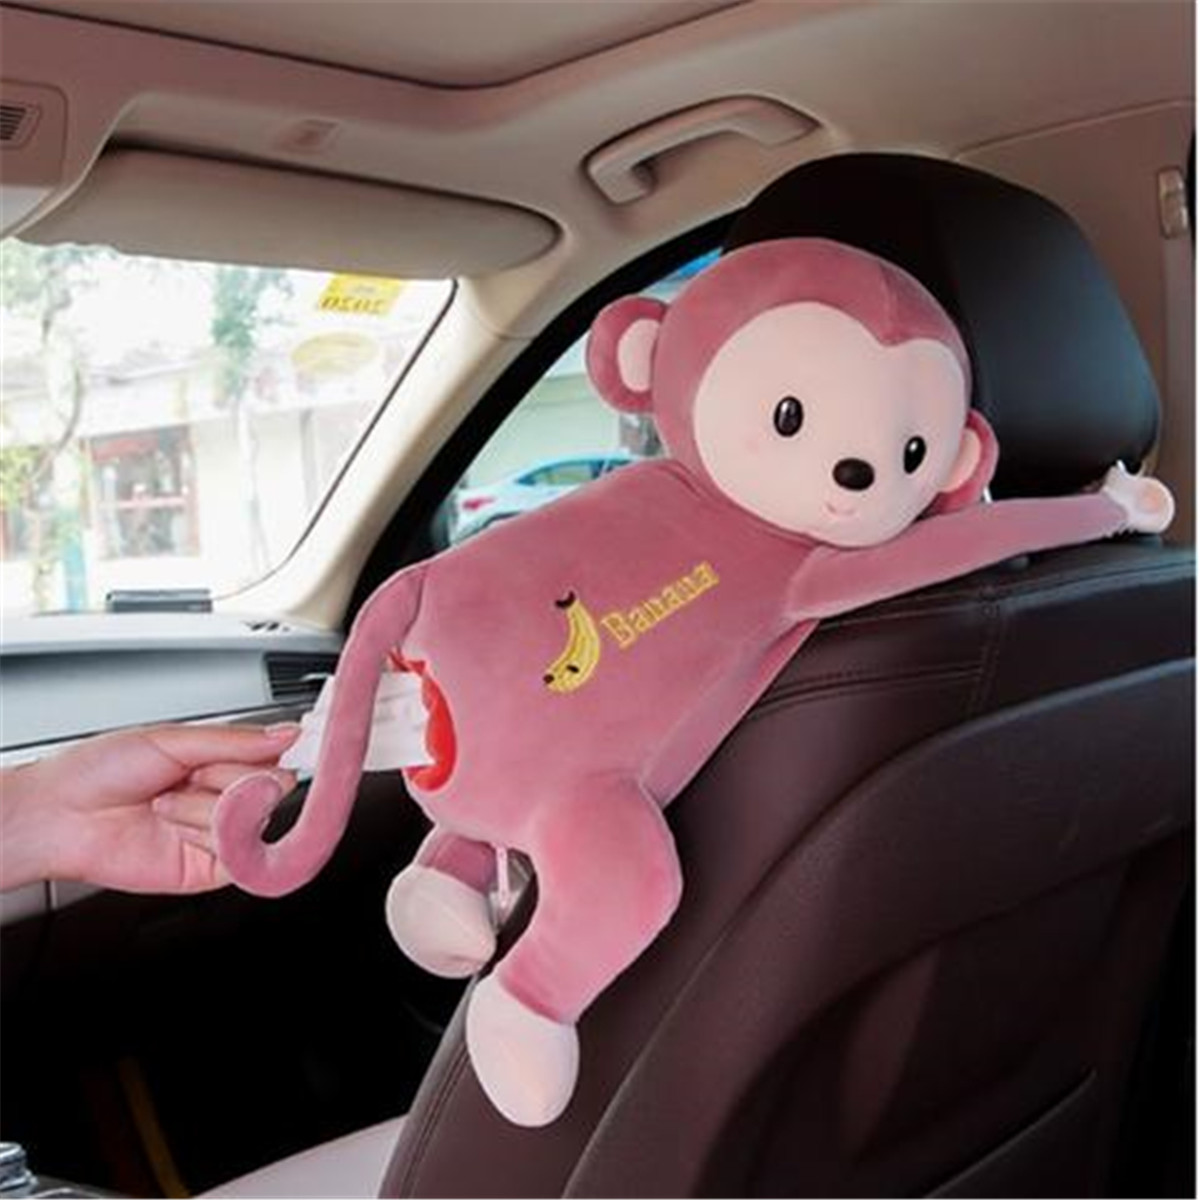 Case Tissue-Box Paper-Napkin Monkey Animals Creative Cartoon Styles Cute Newest Hot-Fashion